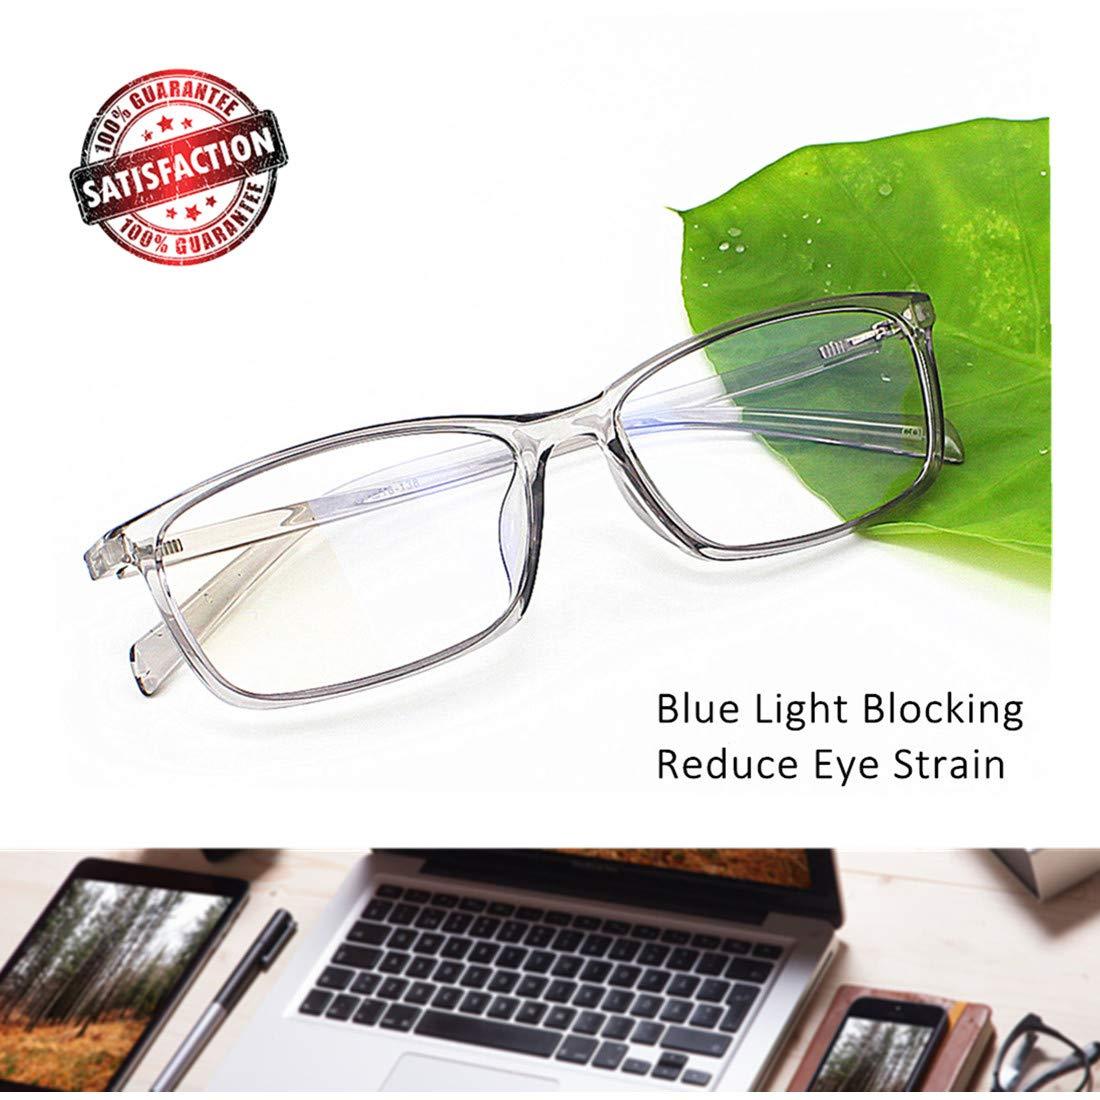 660480f11b43 Amazon.com  Computer Glasses Blue Light Blocking Reader Gaming Screen  Digital Eyeglasses Anti Glare Eye Strain Transparent Lens UV Light Weight  for Women ...